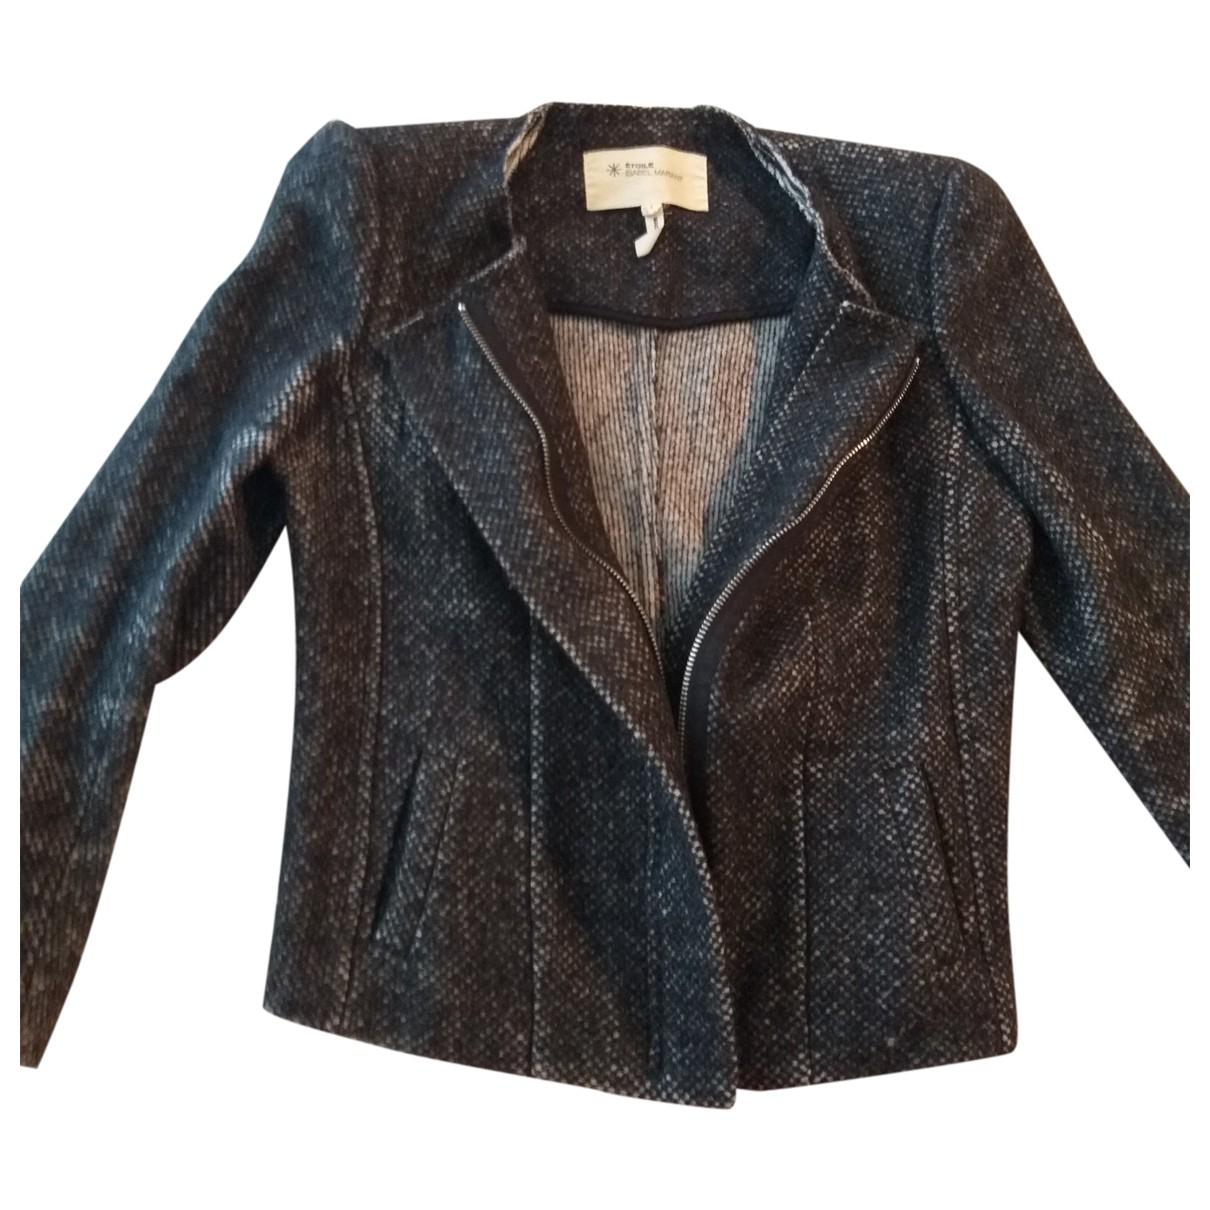 Isabel Marant Etoile N Black Wool jacket for Women 1 0-5